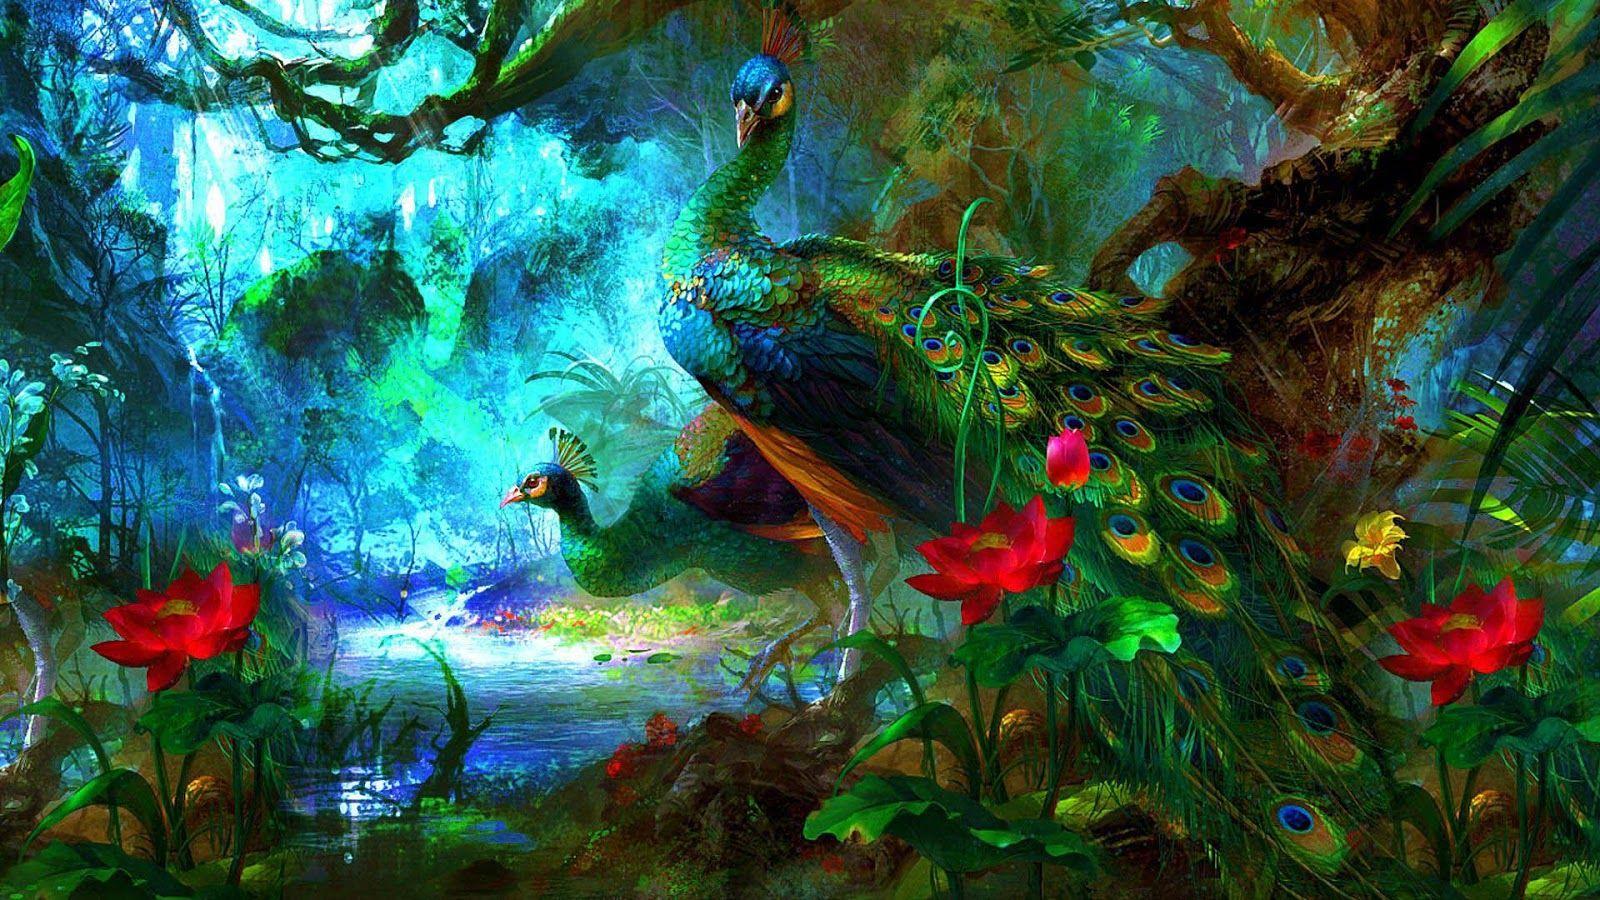 Peacock Walls Hd 3d 4d Imgs Jpg 1600 900 Peacock Wallpaper Peacock Painting Peacock Images